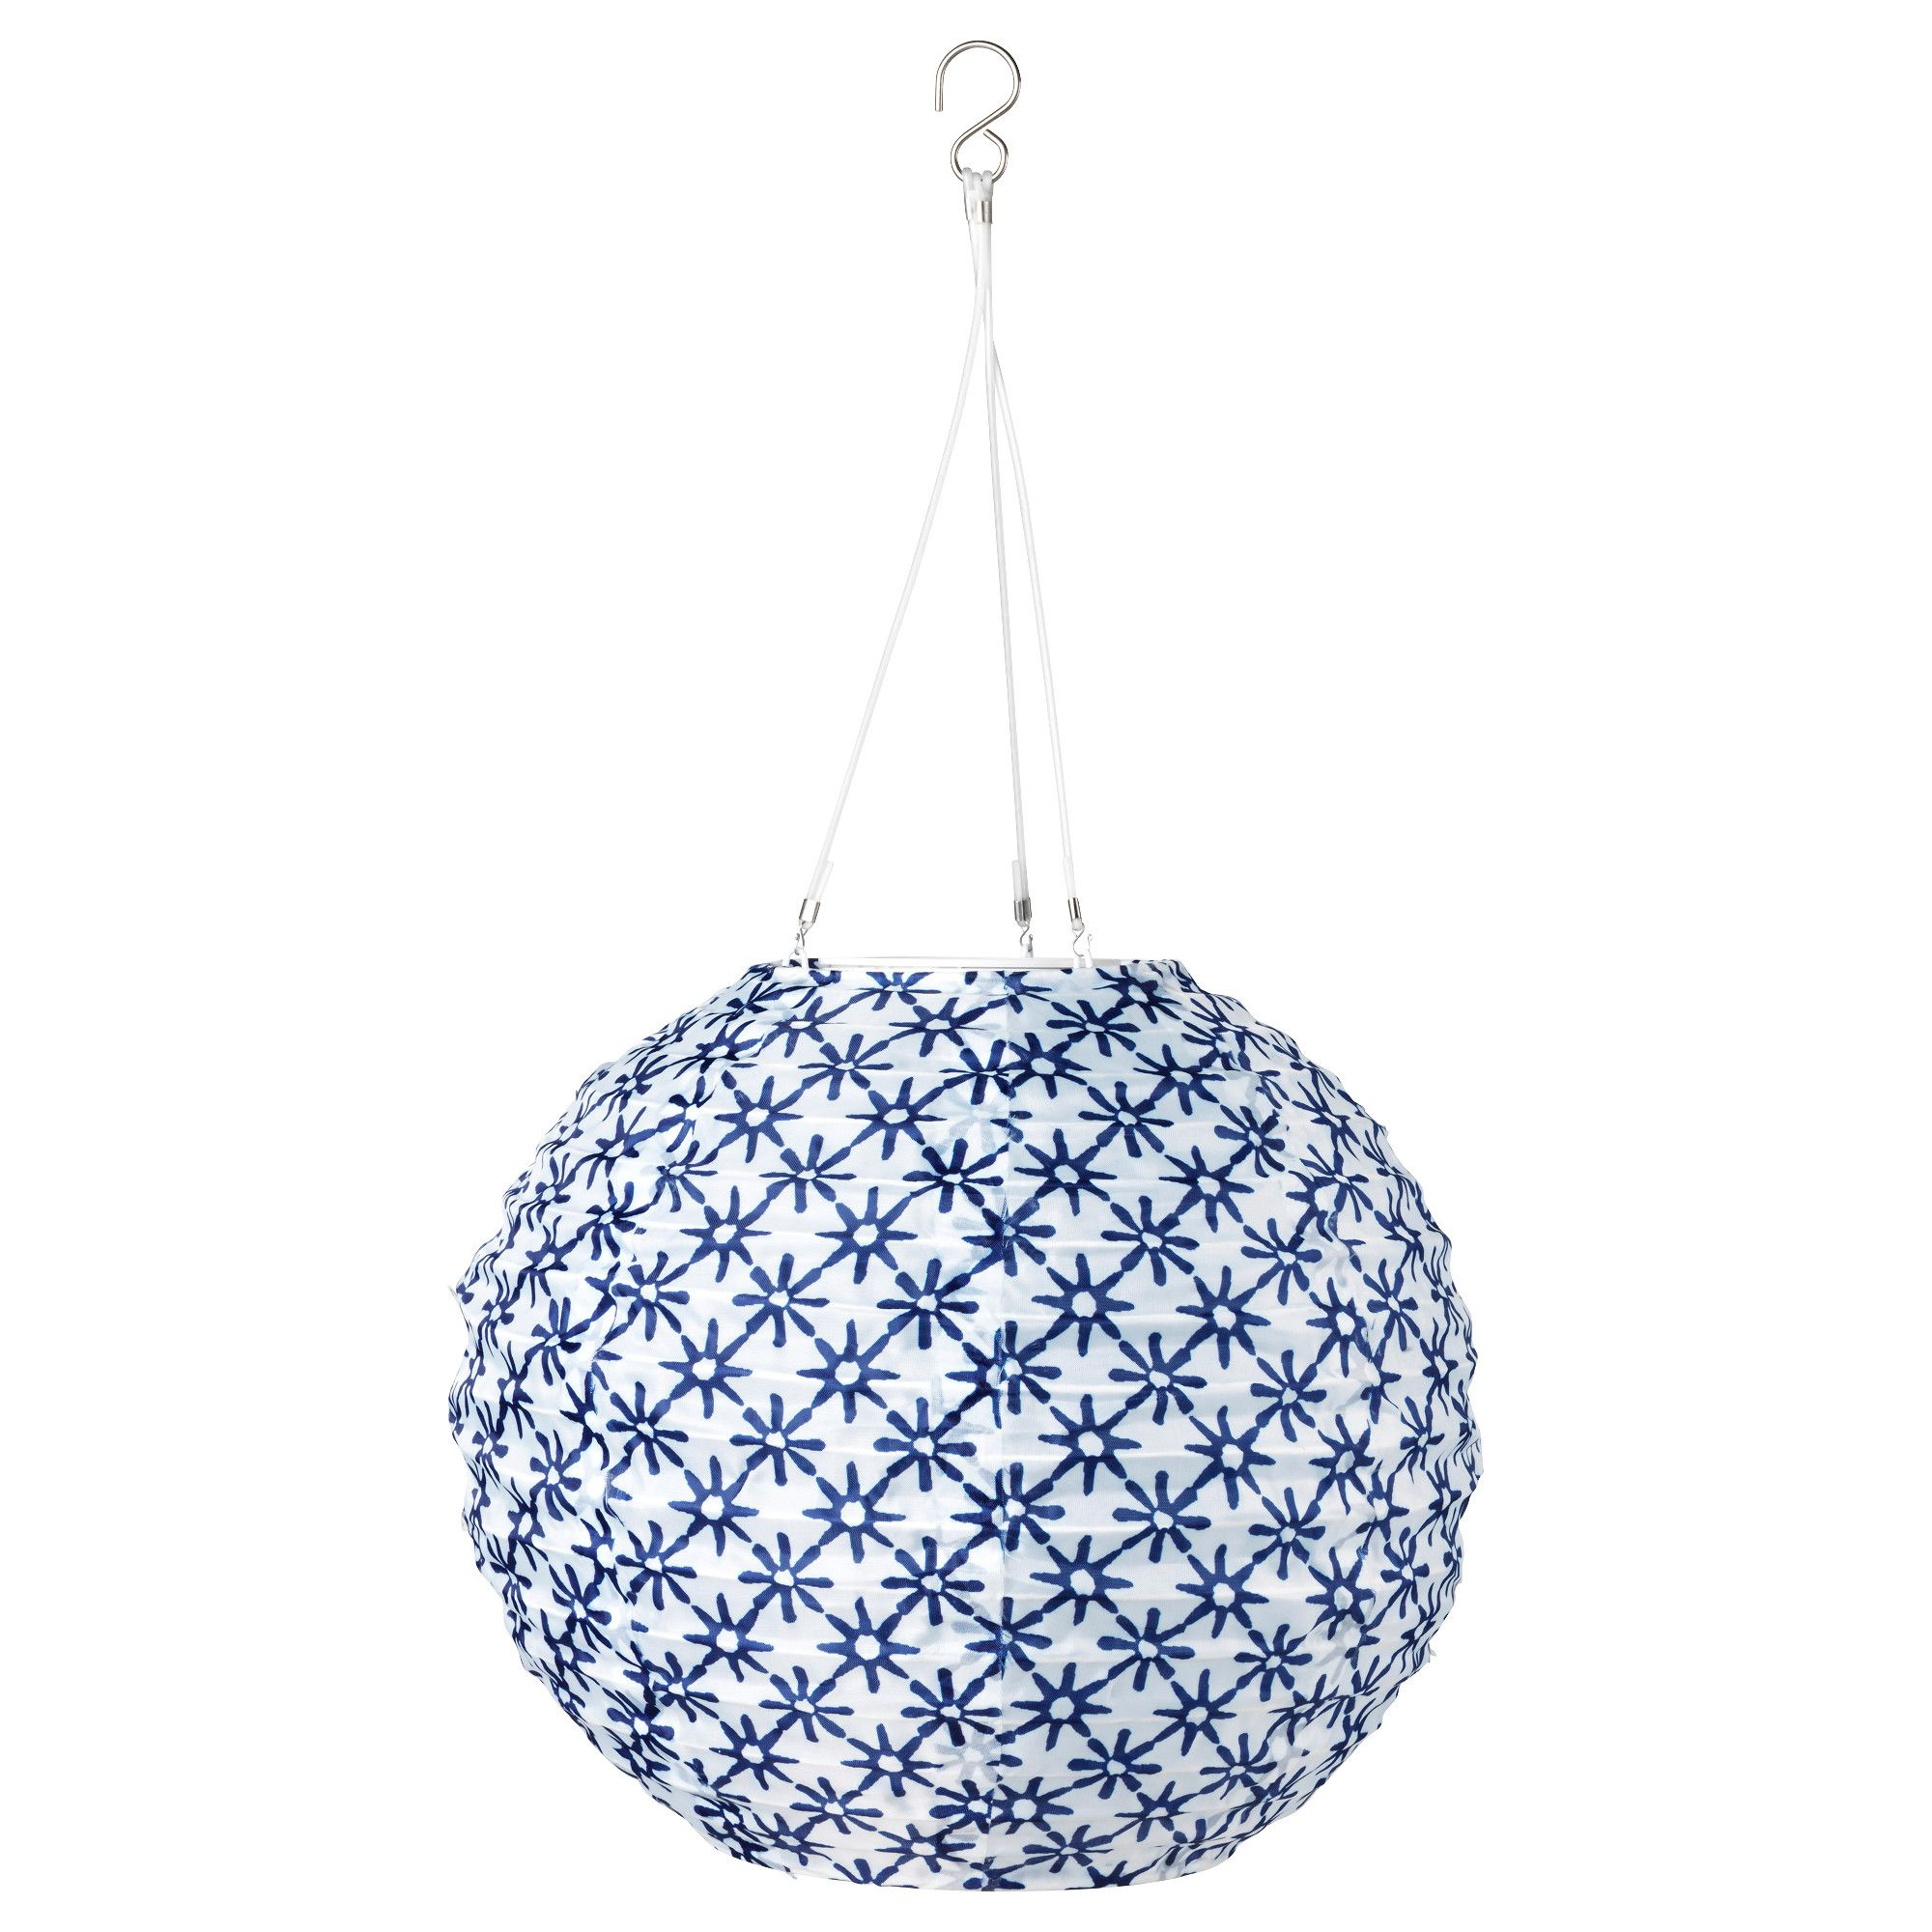 ikea solar lighting. IKEA - SOLVINDEN, LED Solar-powered Pendant Lamp, Ikea Solar Lighting E